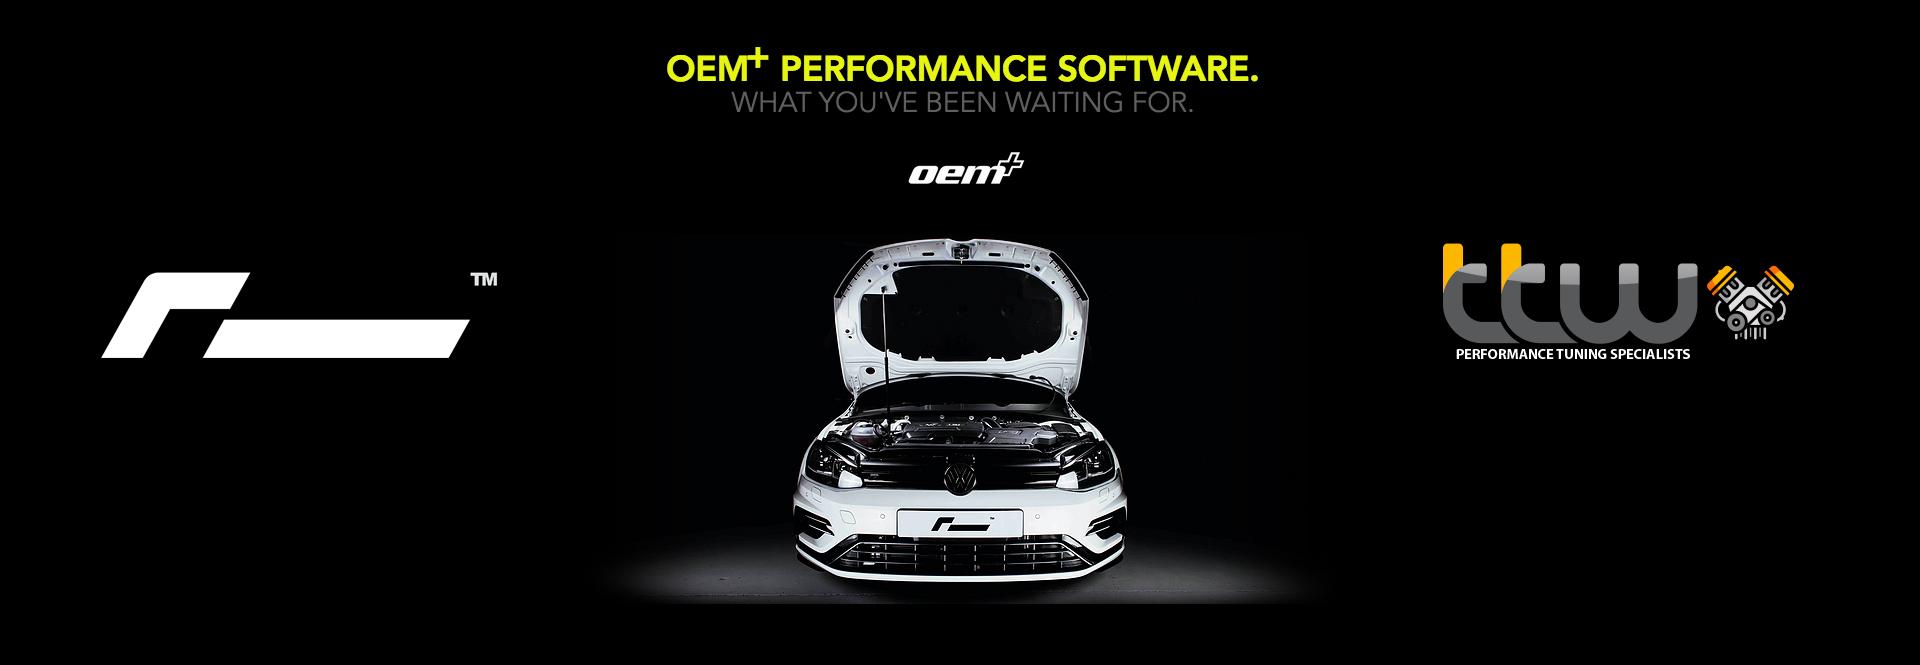 TTW – PERFORMANCE OFFERING: RACINGLINE PERFORMANCE | EAST MIDLANDS No1 OEM TUNING & ACCESSORIES FOR VW – AUDI – SKODA – SEAT - NOTTINGHAM - DERBY - EAST MIDLANDS